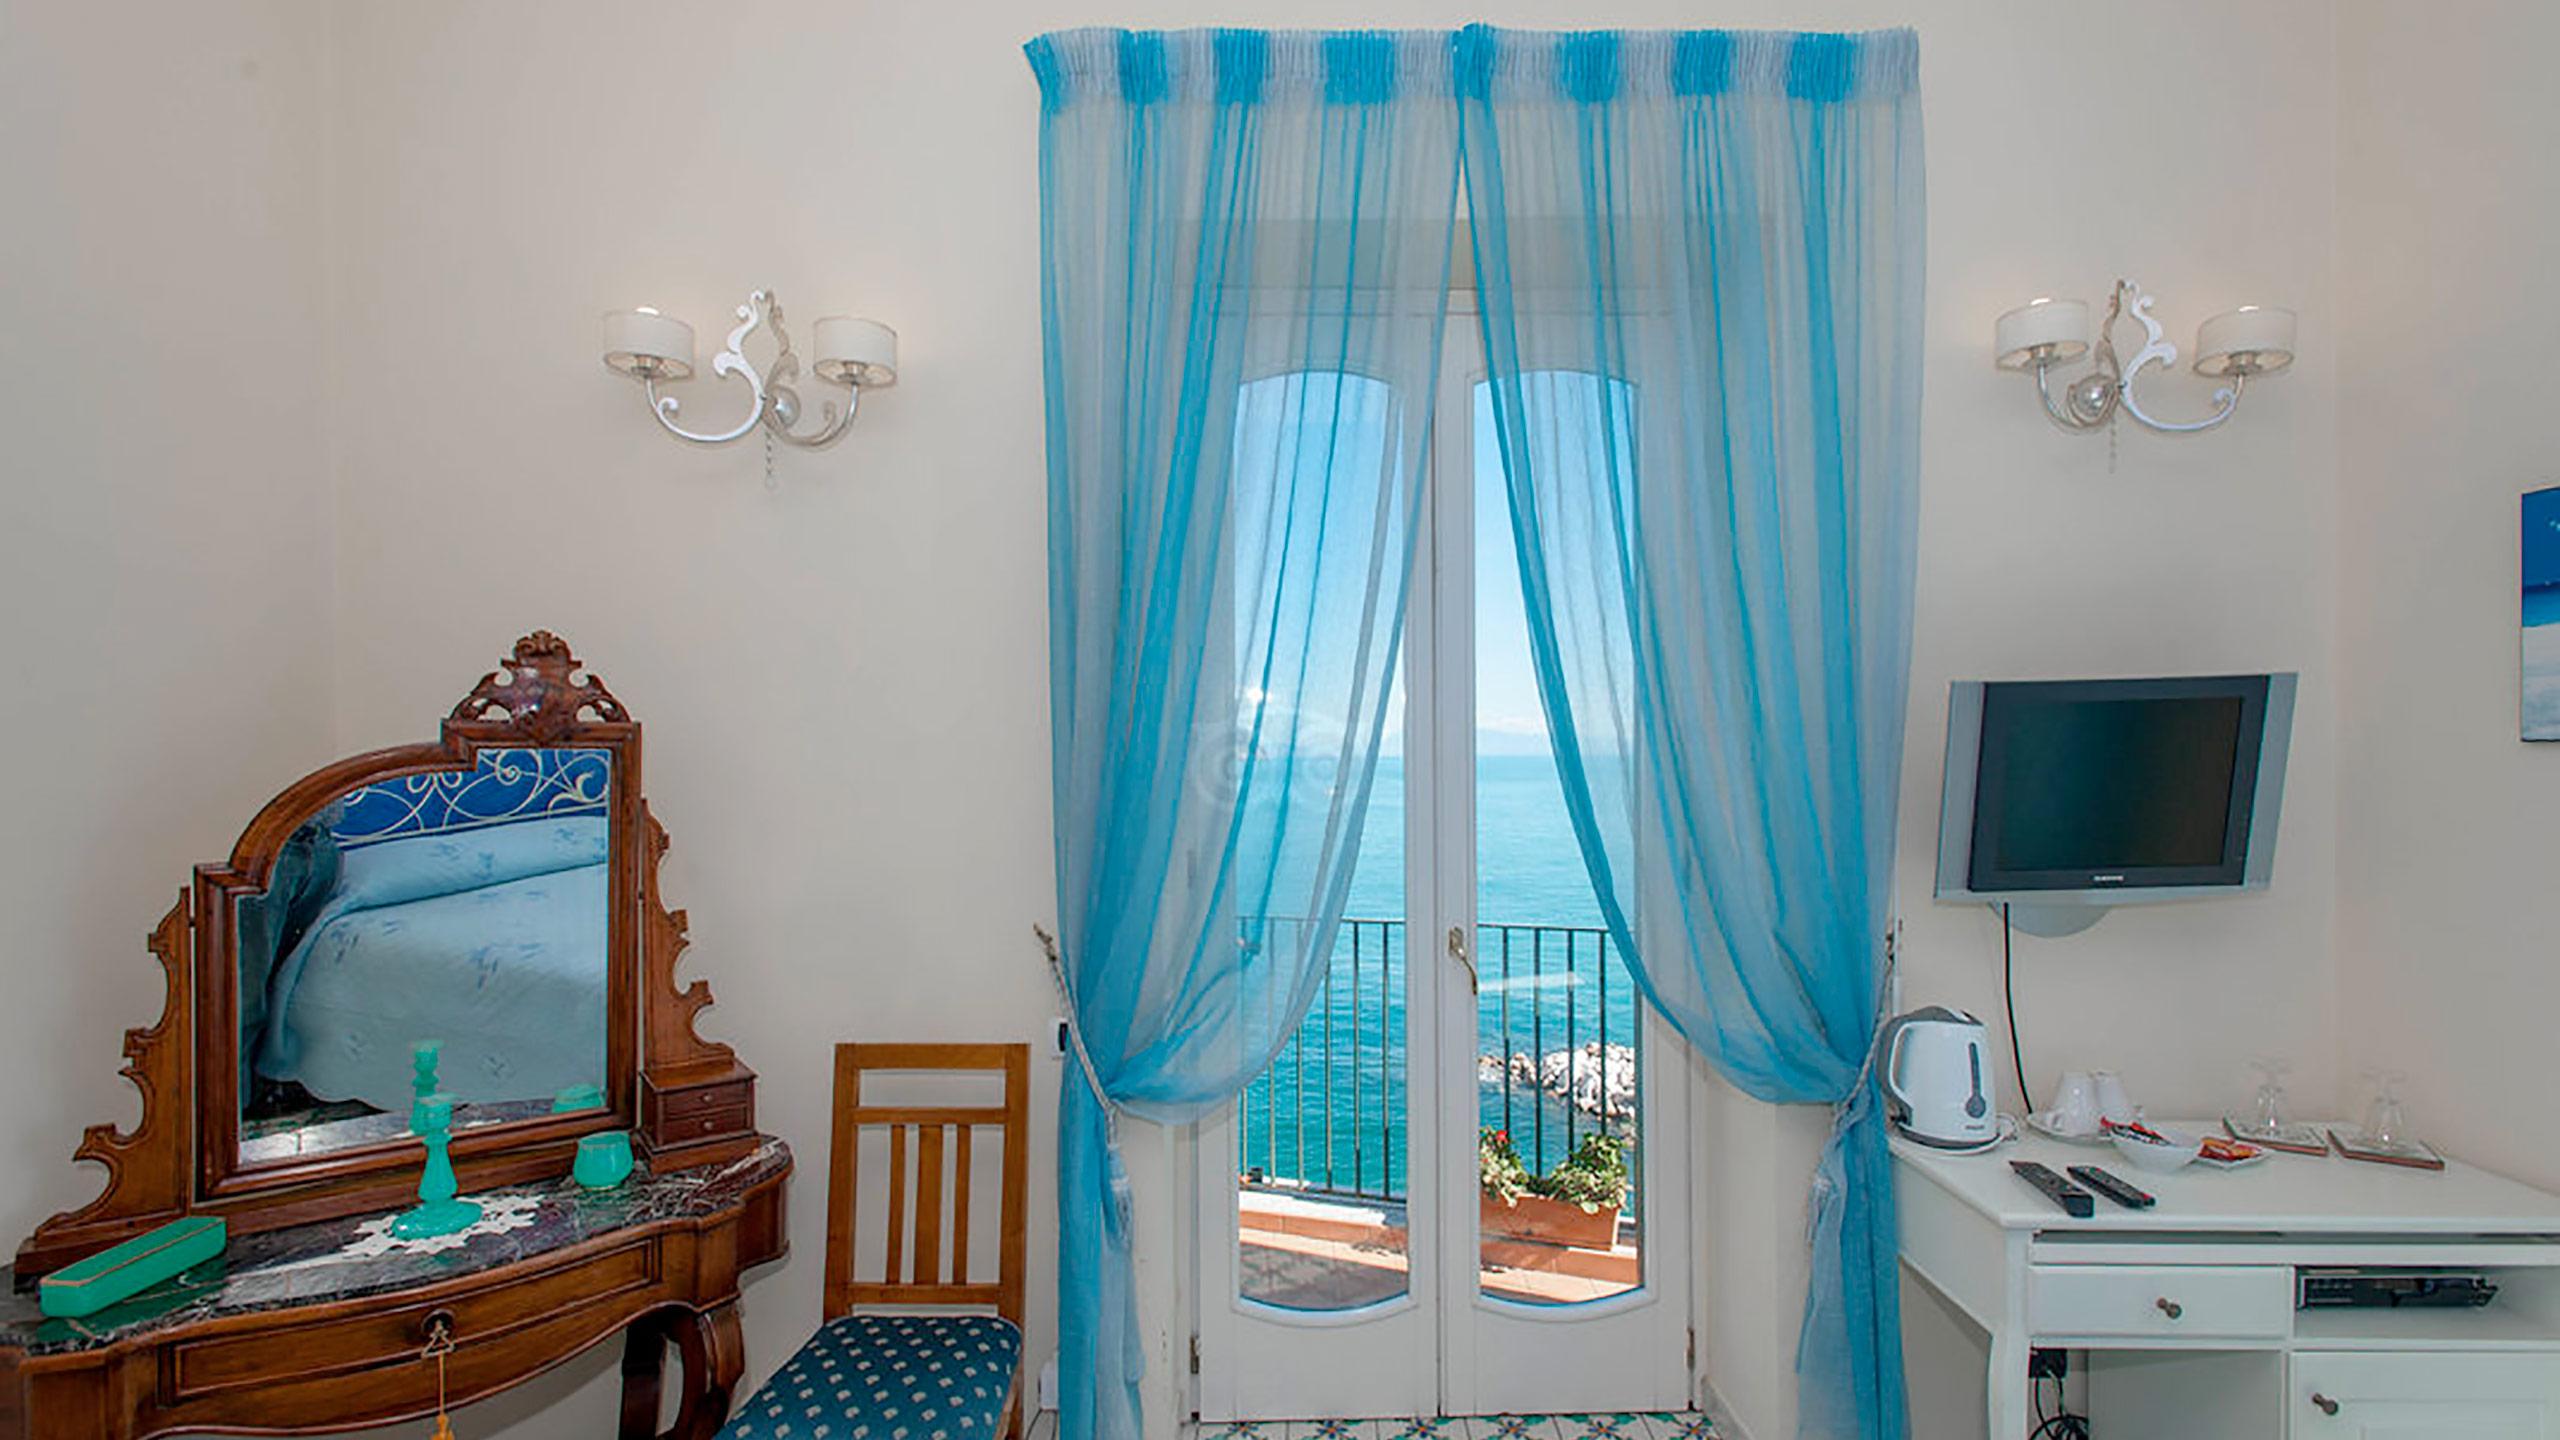 la-rondine-room--v10056897